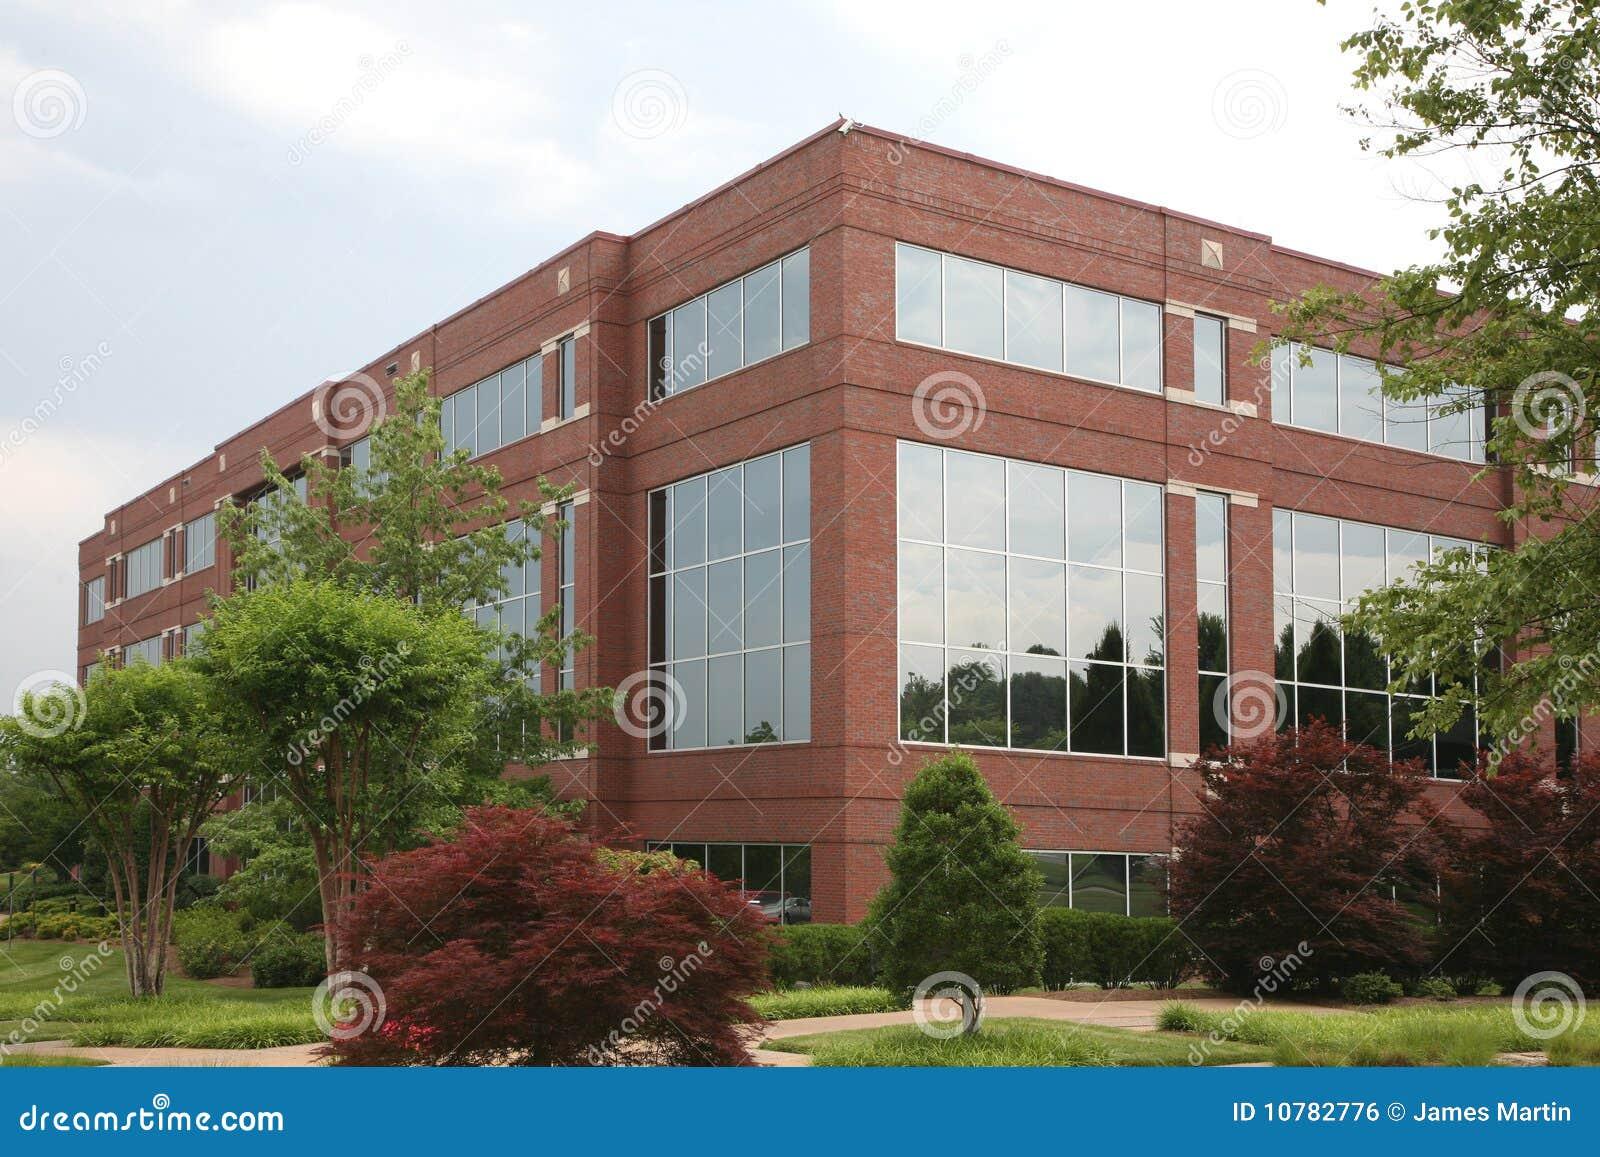 Suburban office building